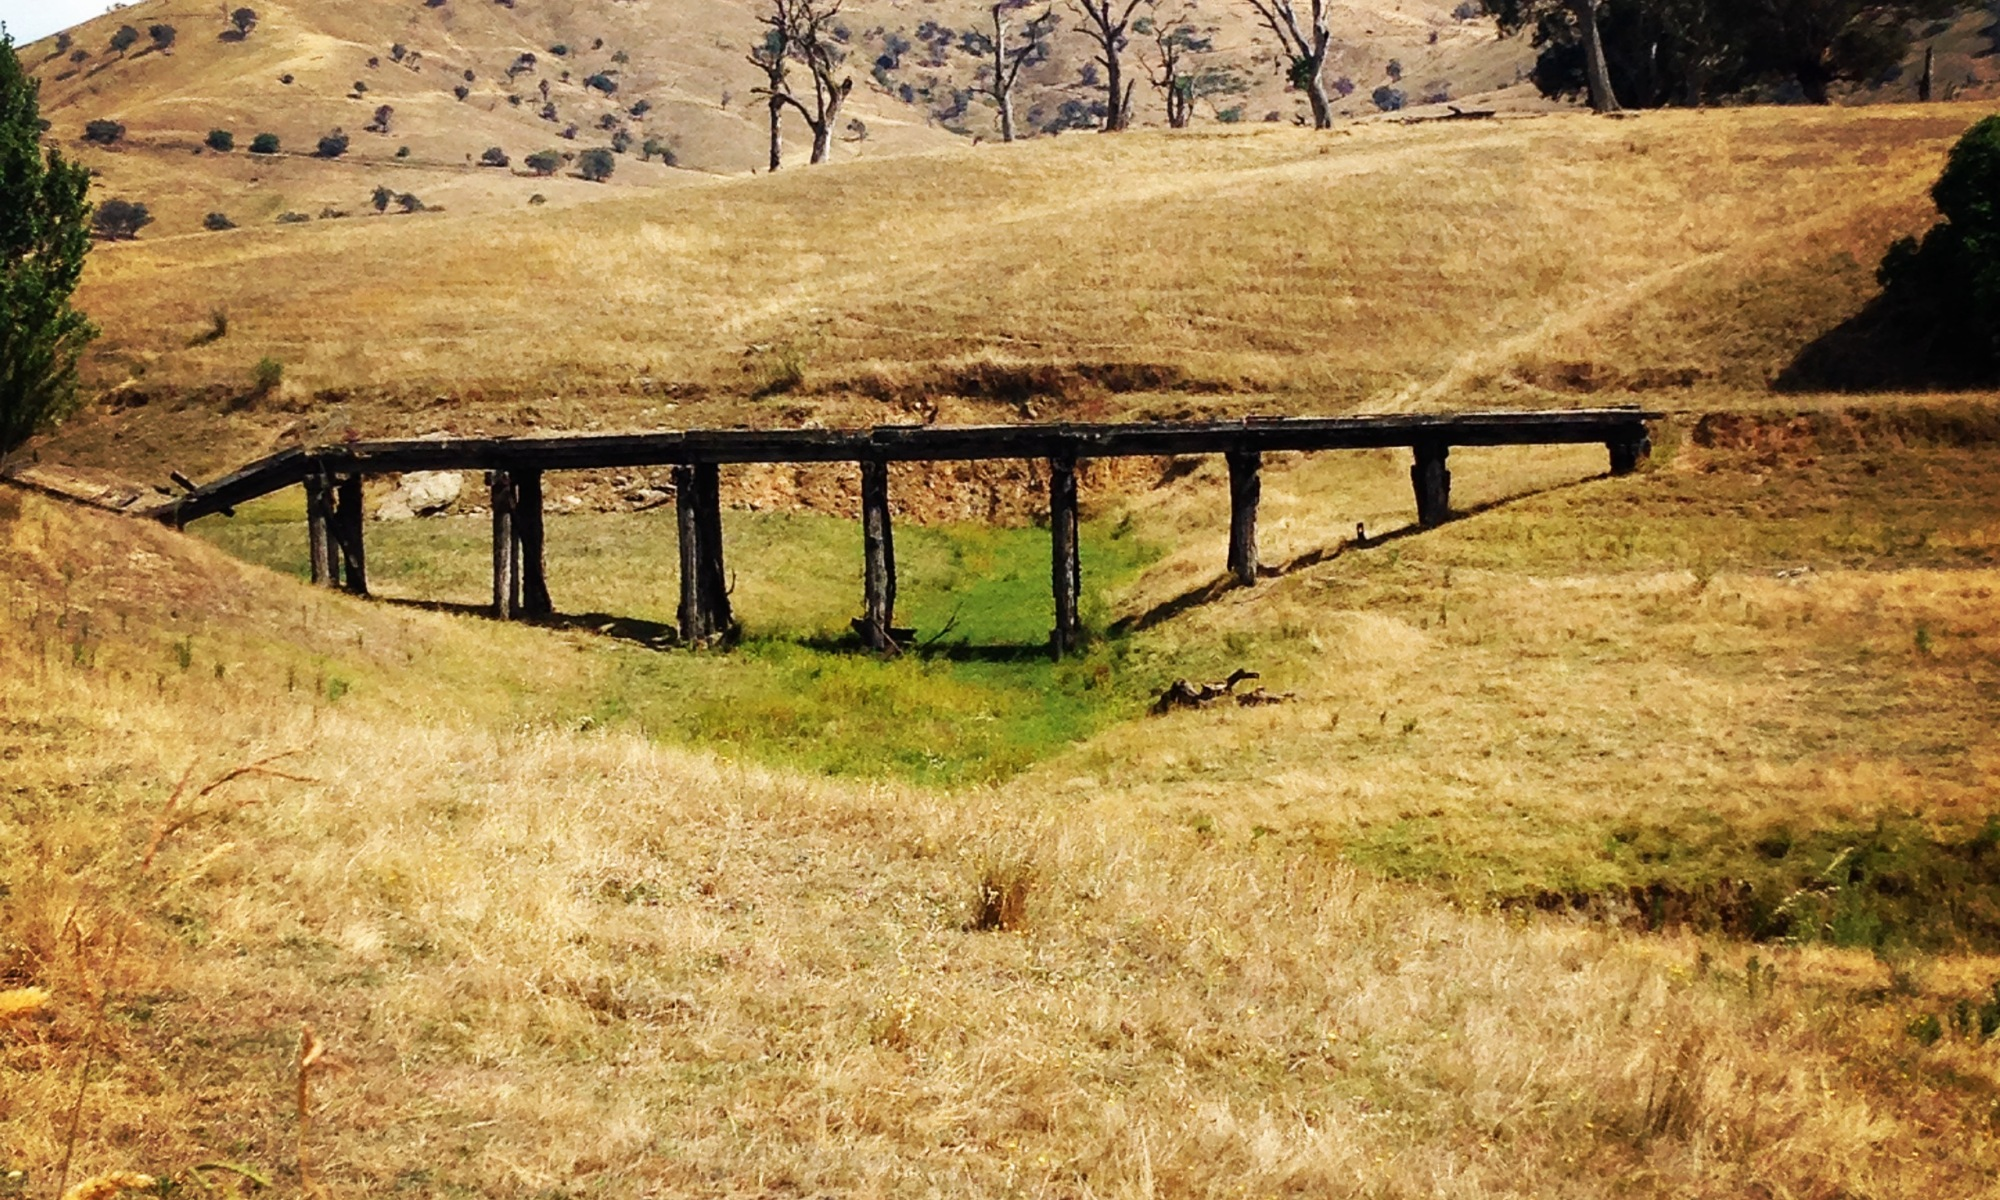 Trestle bridge from old railway days